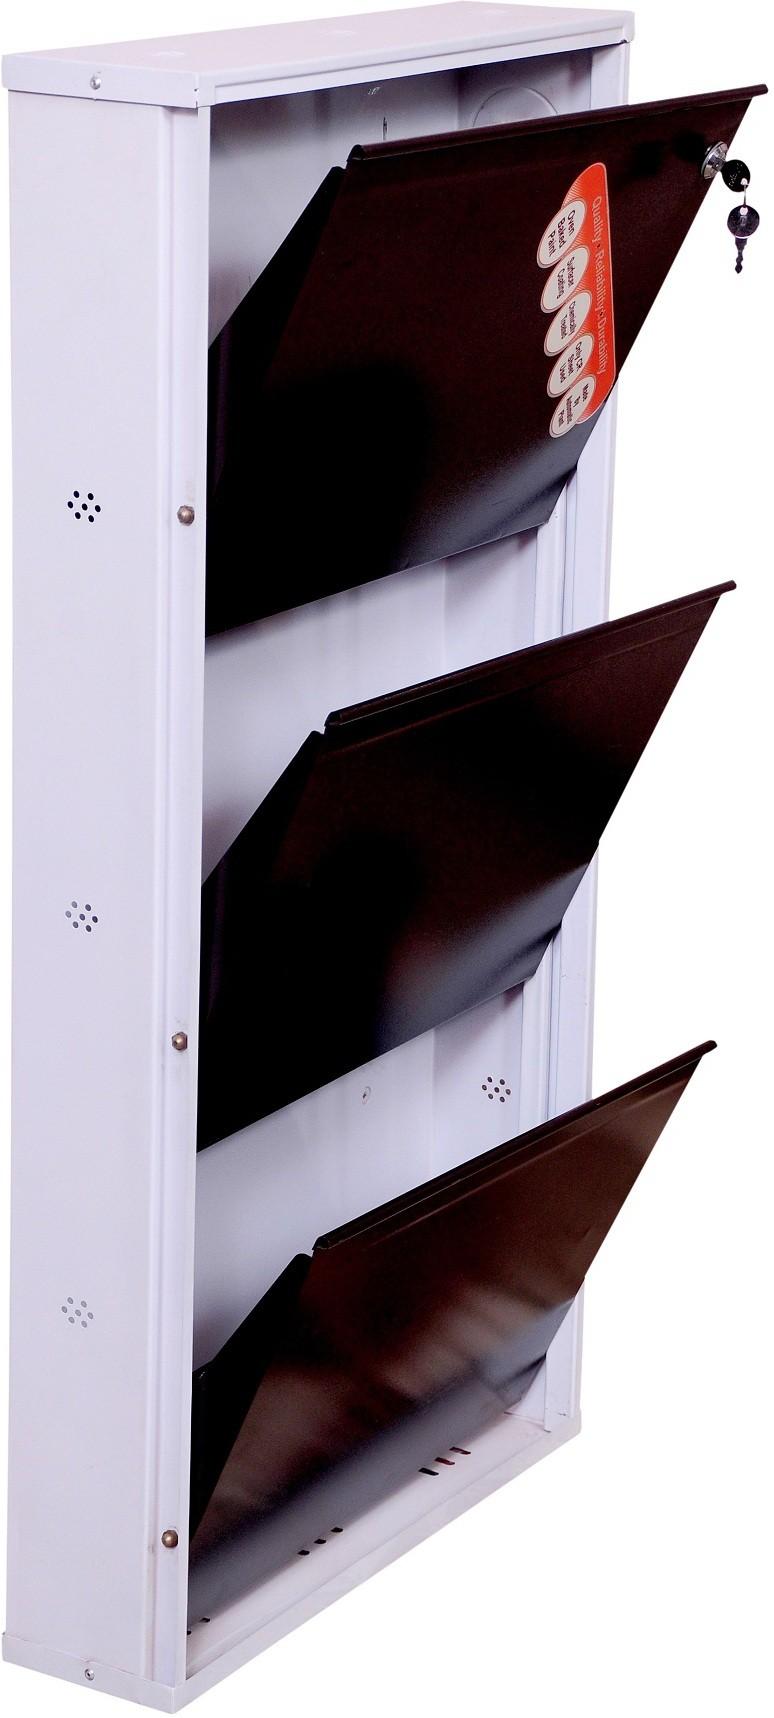 View Brats N Angels Carbon Steel Shoe Cabinet(3 Shelves) Furniture (Brats N Angels)